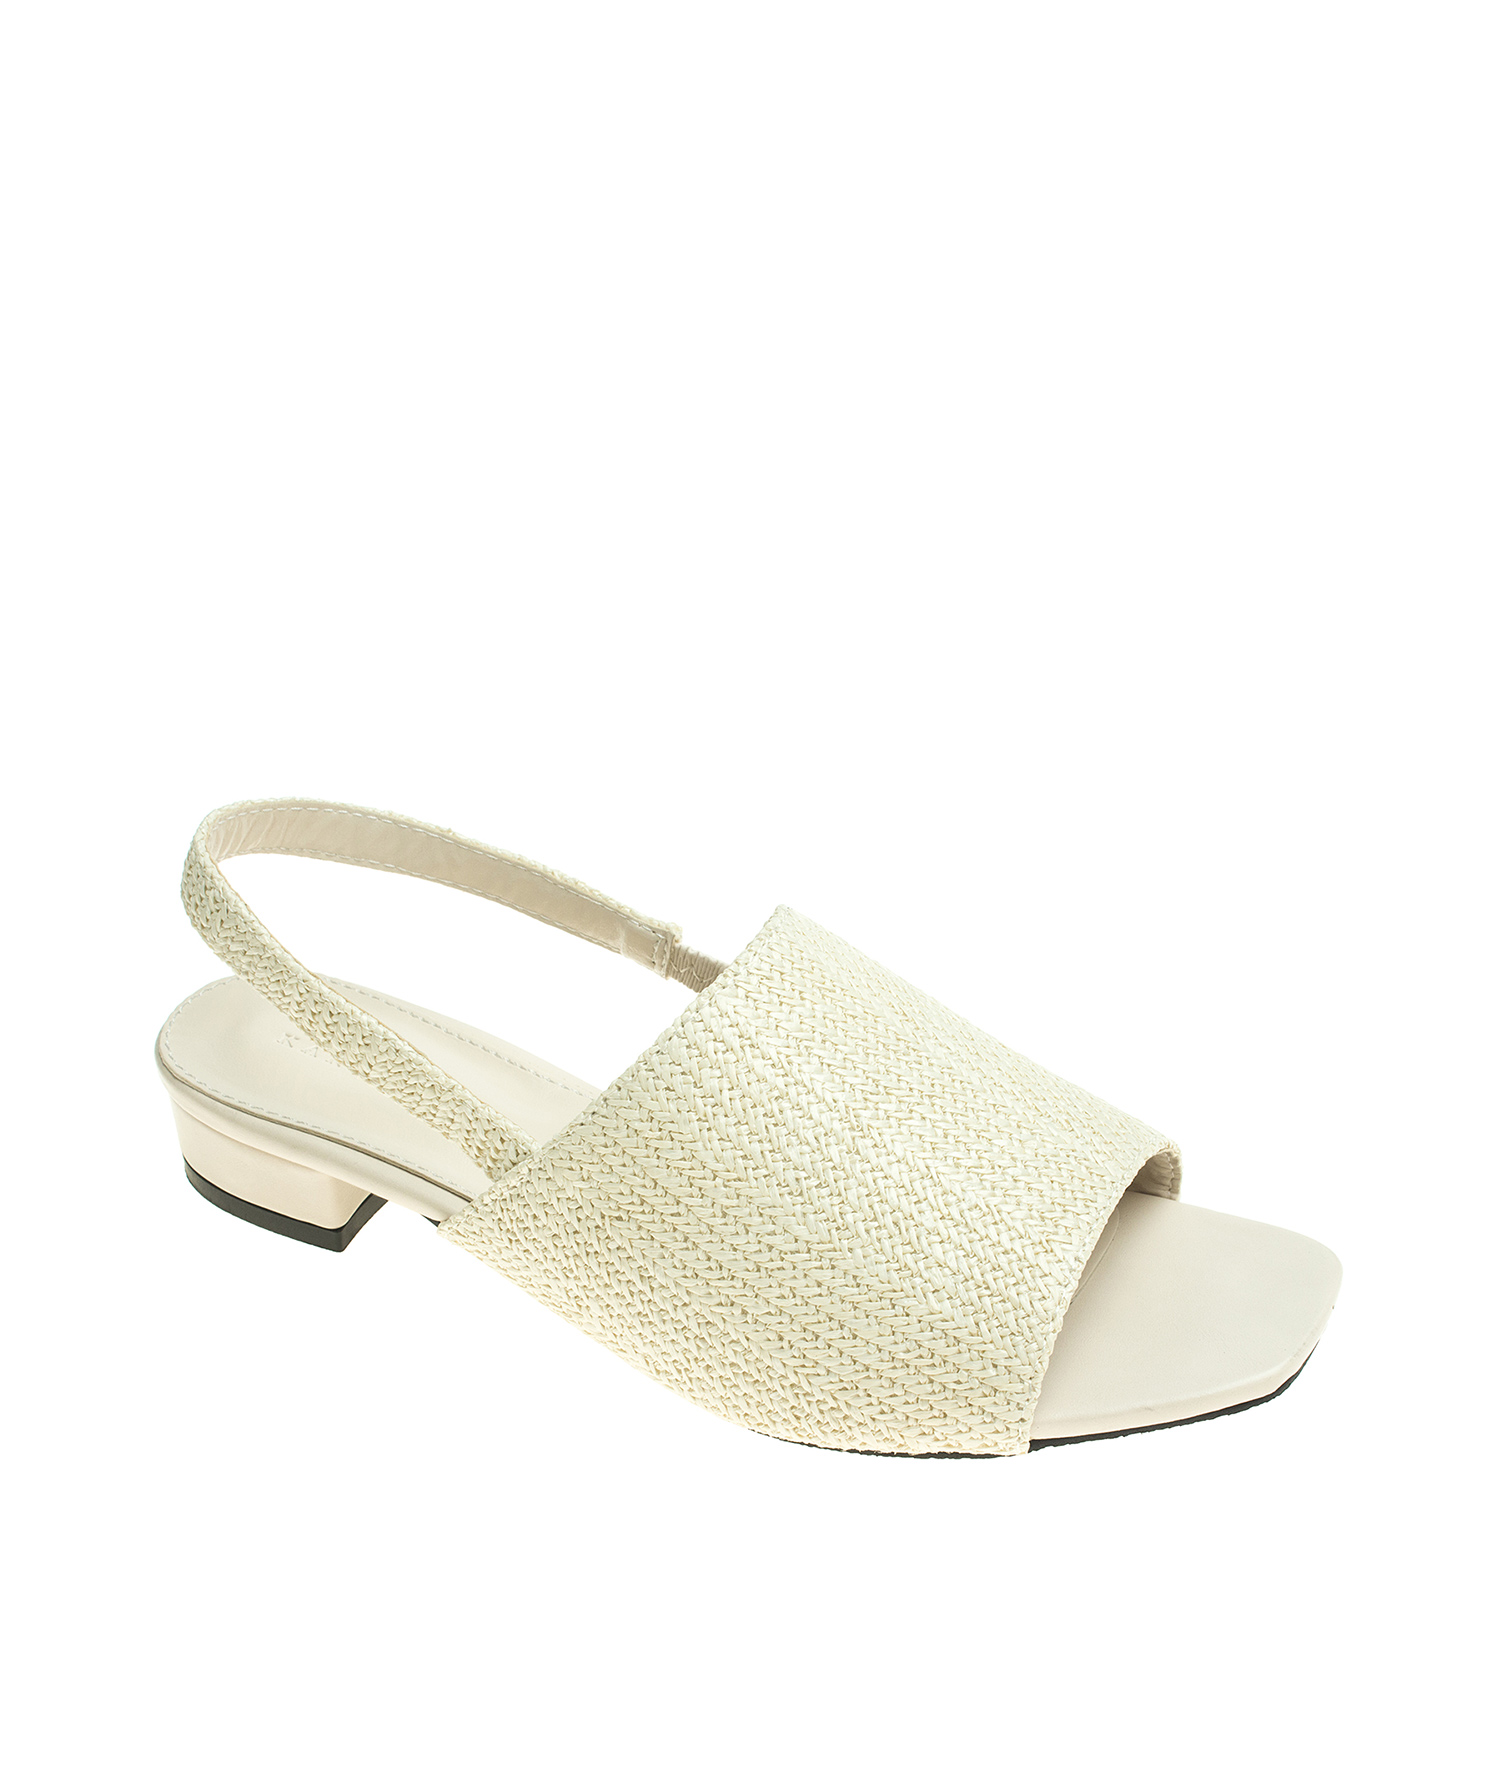 87b3d91501e61 Cr annakastle womens natural color open toe woven slingback flat mule  sandals ivory jpg 1500x1765 Open